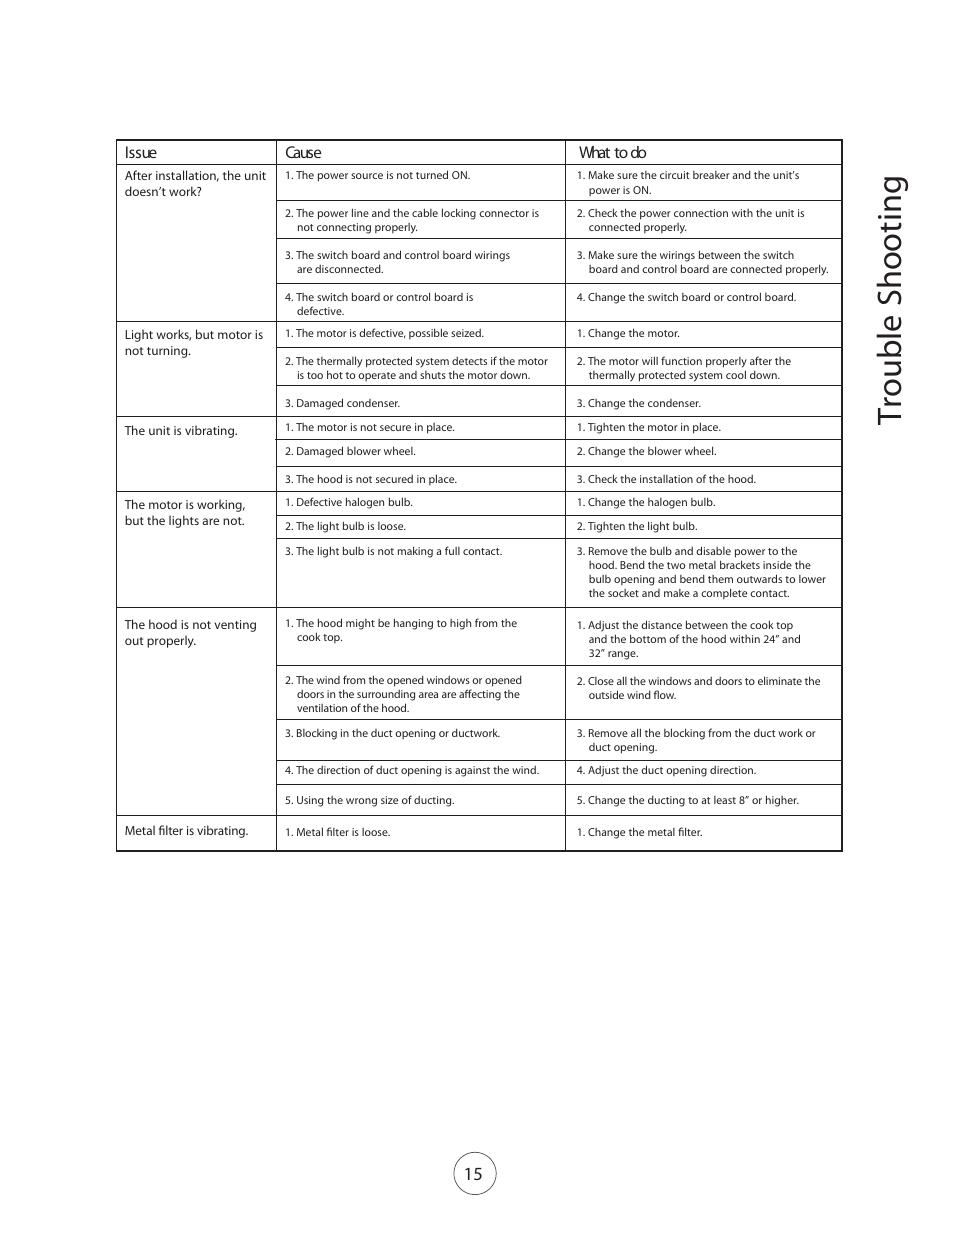 Zephyr User Manual